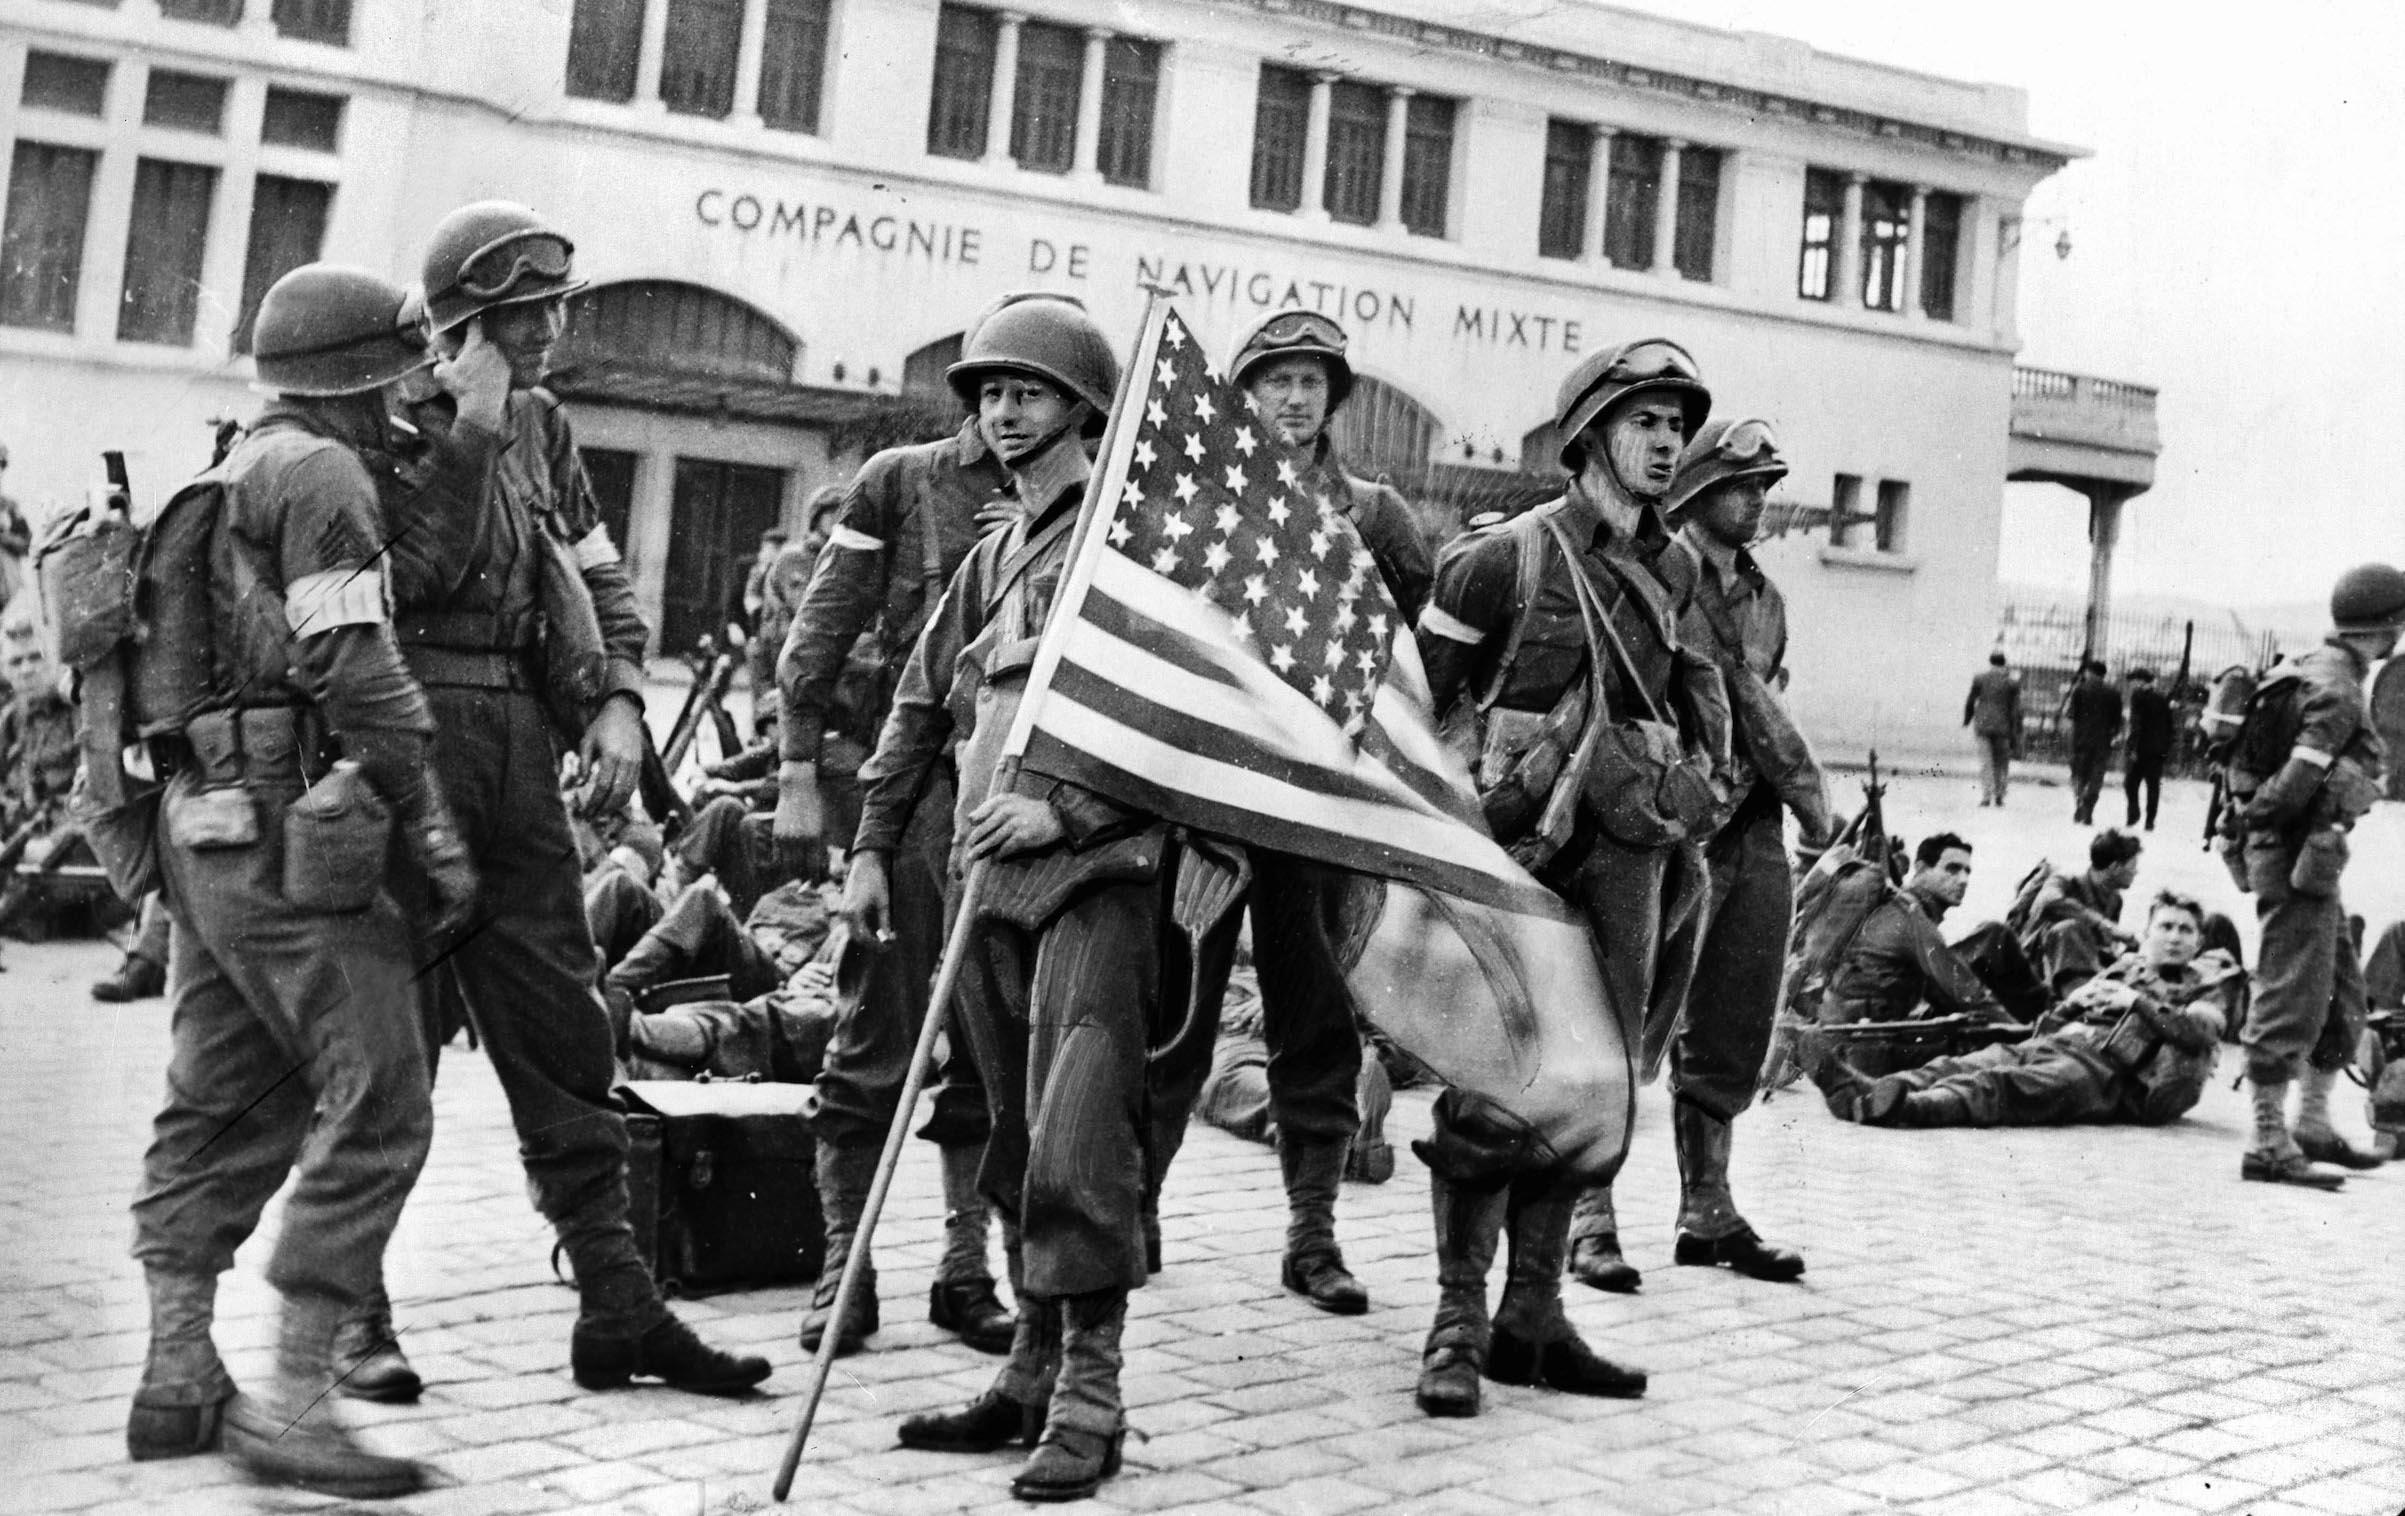 The American landing in Casablanca, Morocco, November 1942.